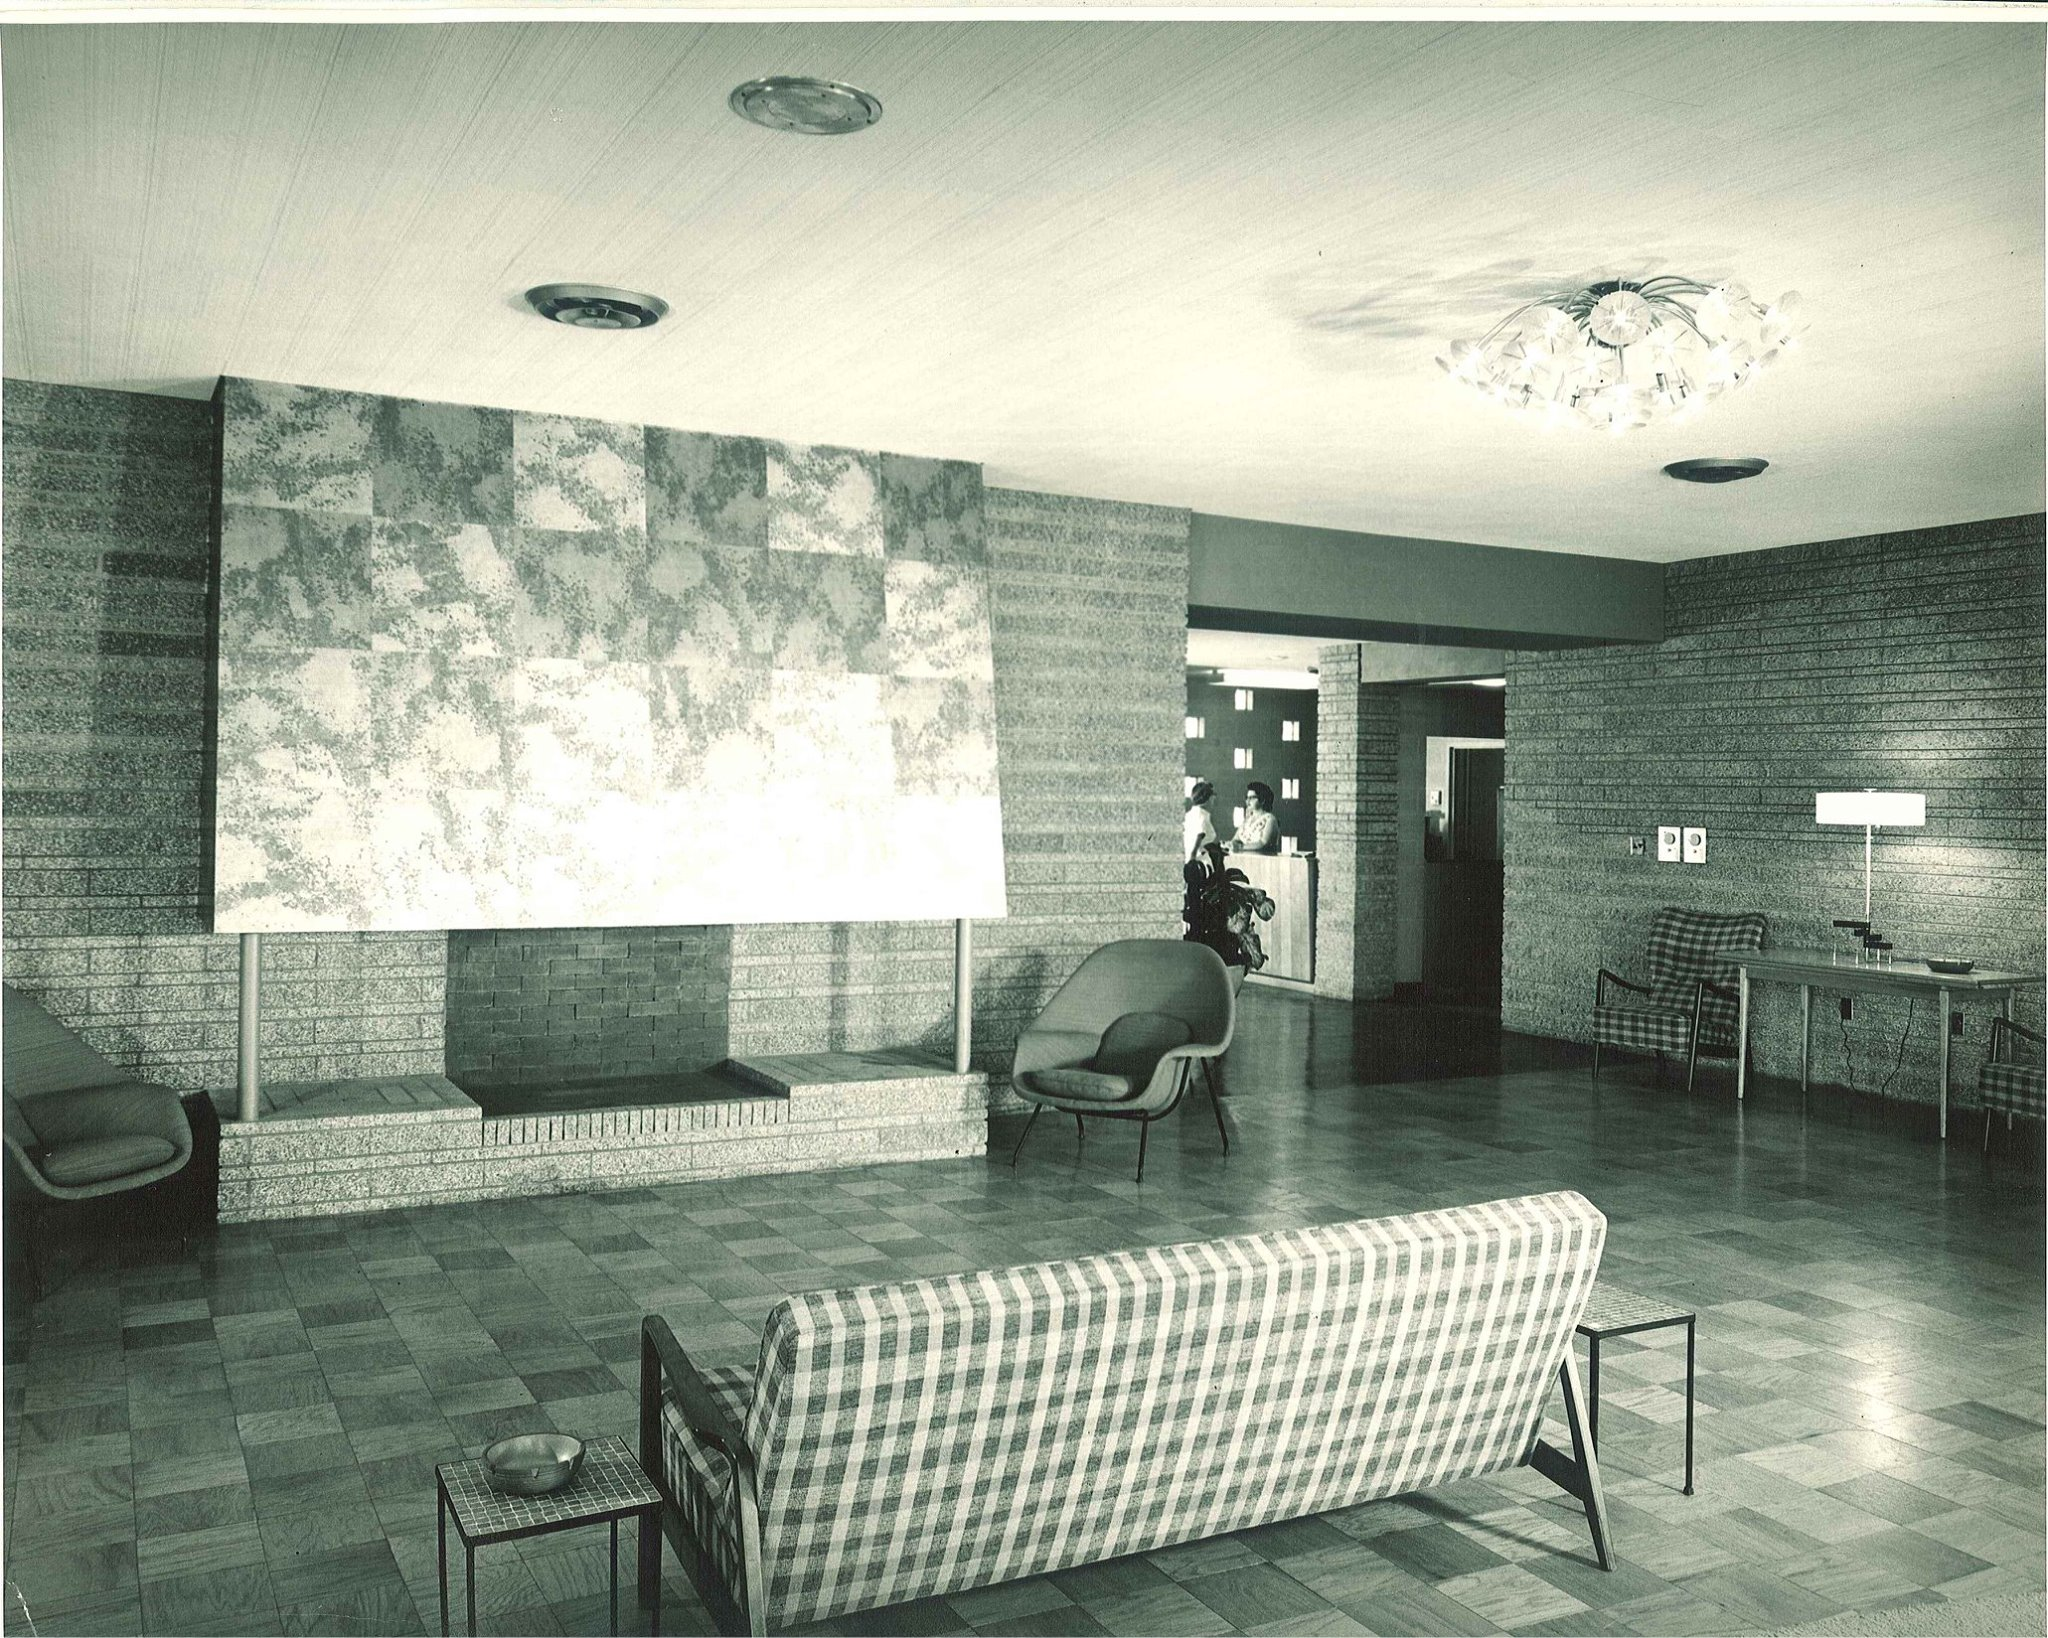 1955CountryClub2.jpg